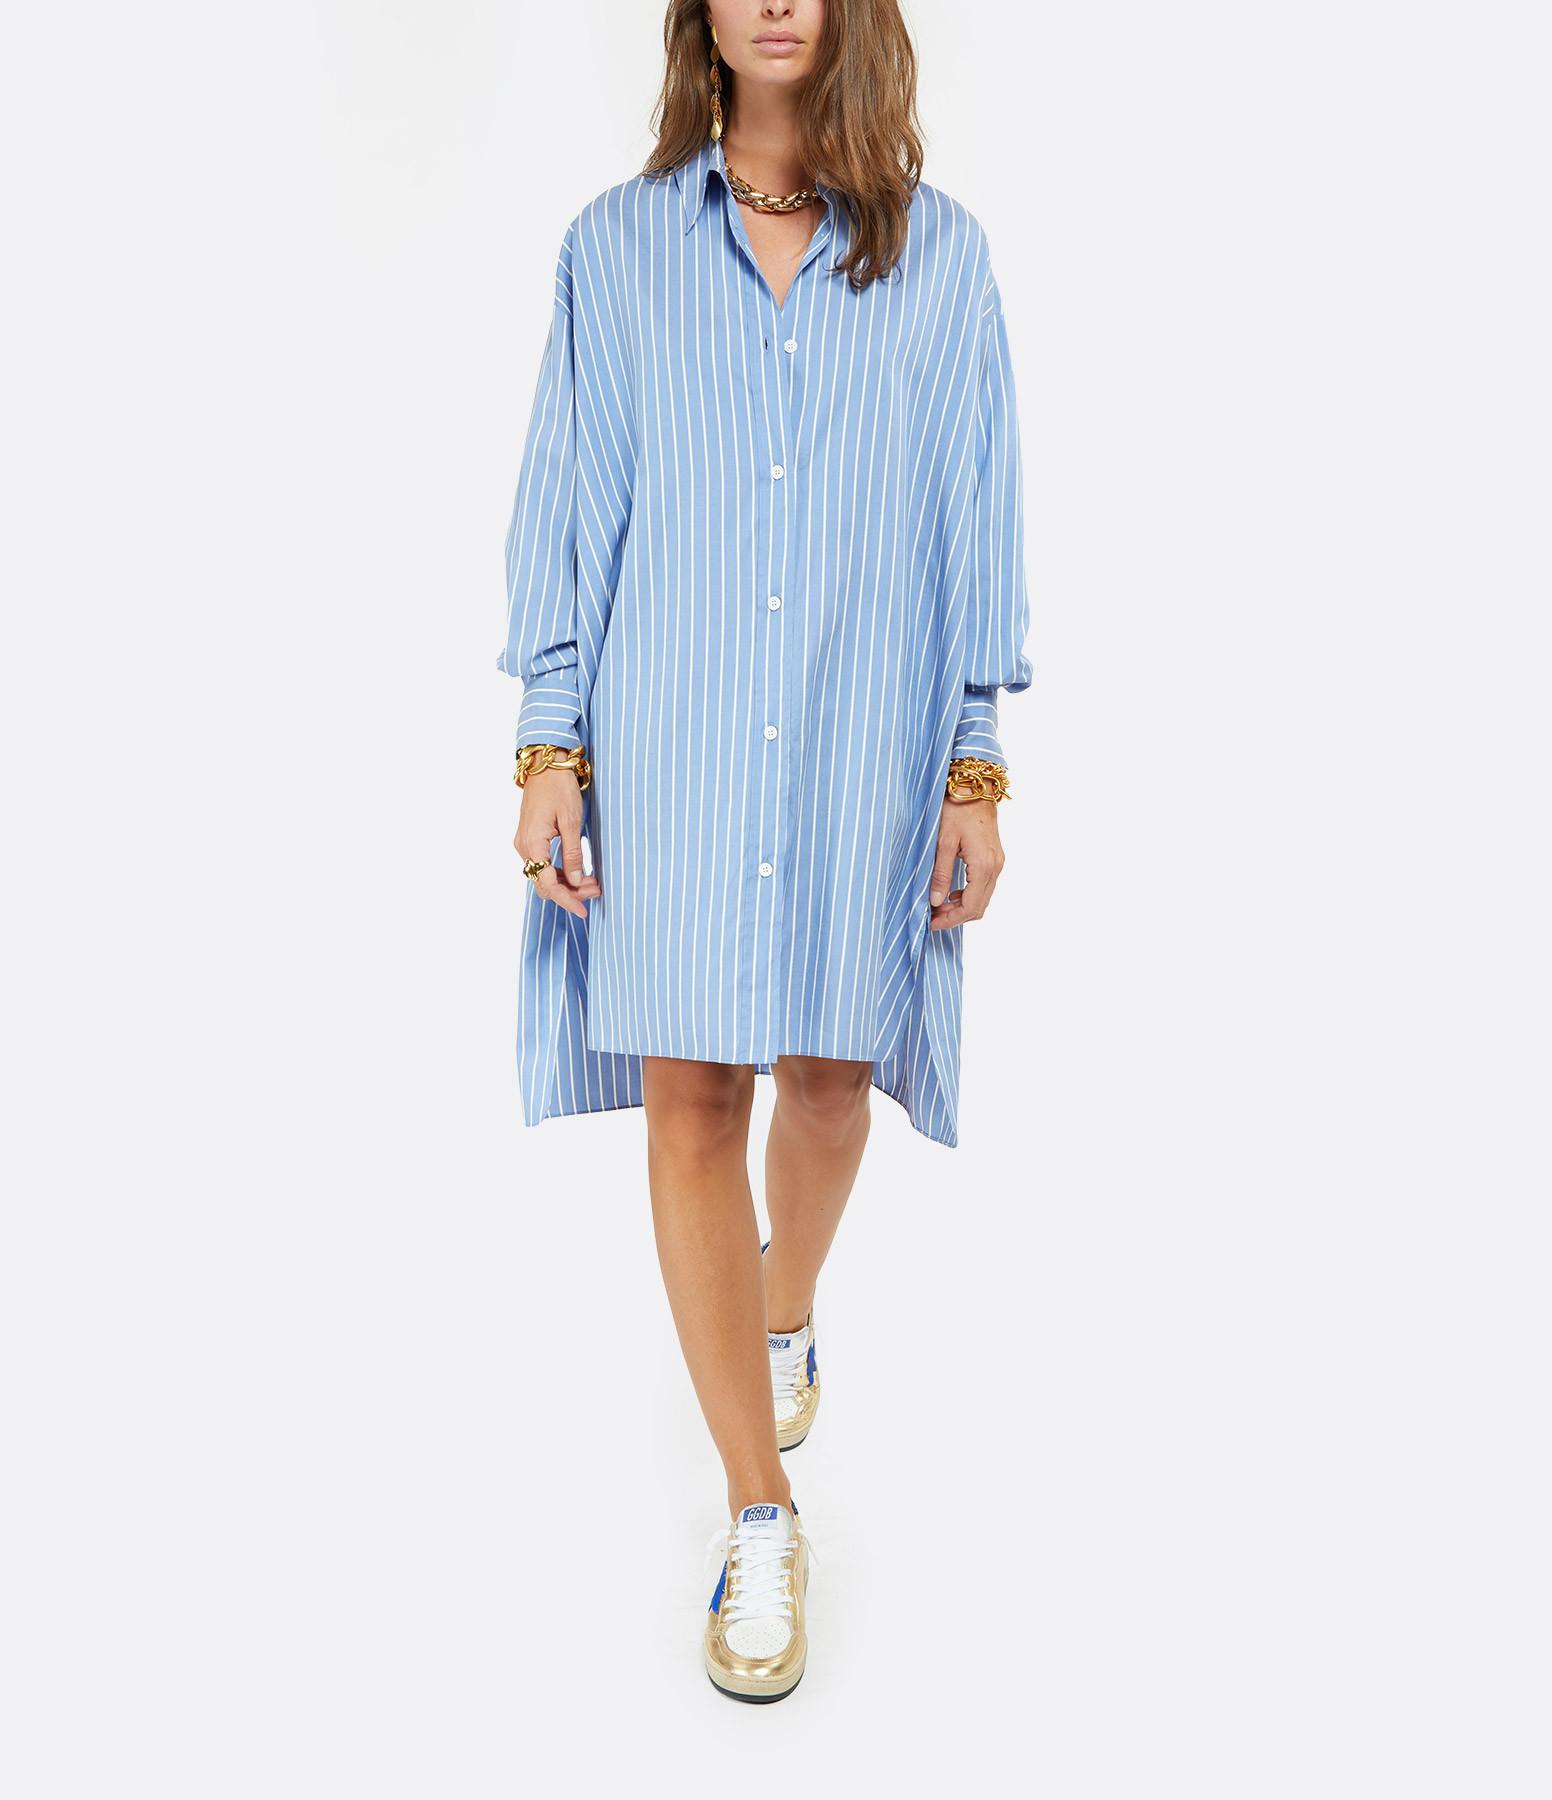 ISABEL MARANT - Chemise Macali Coton Bleu